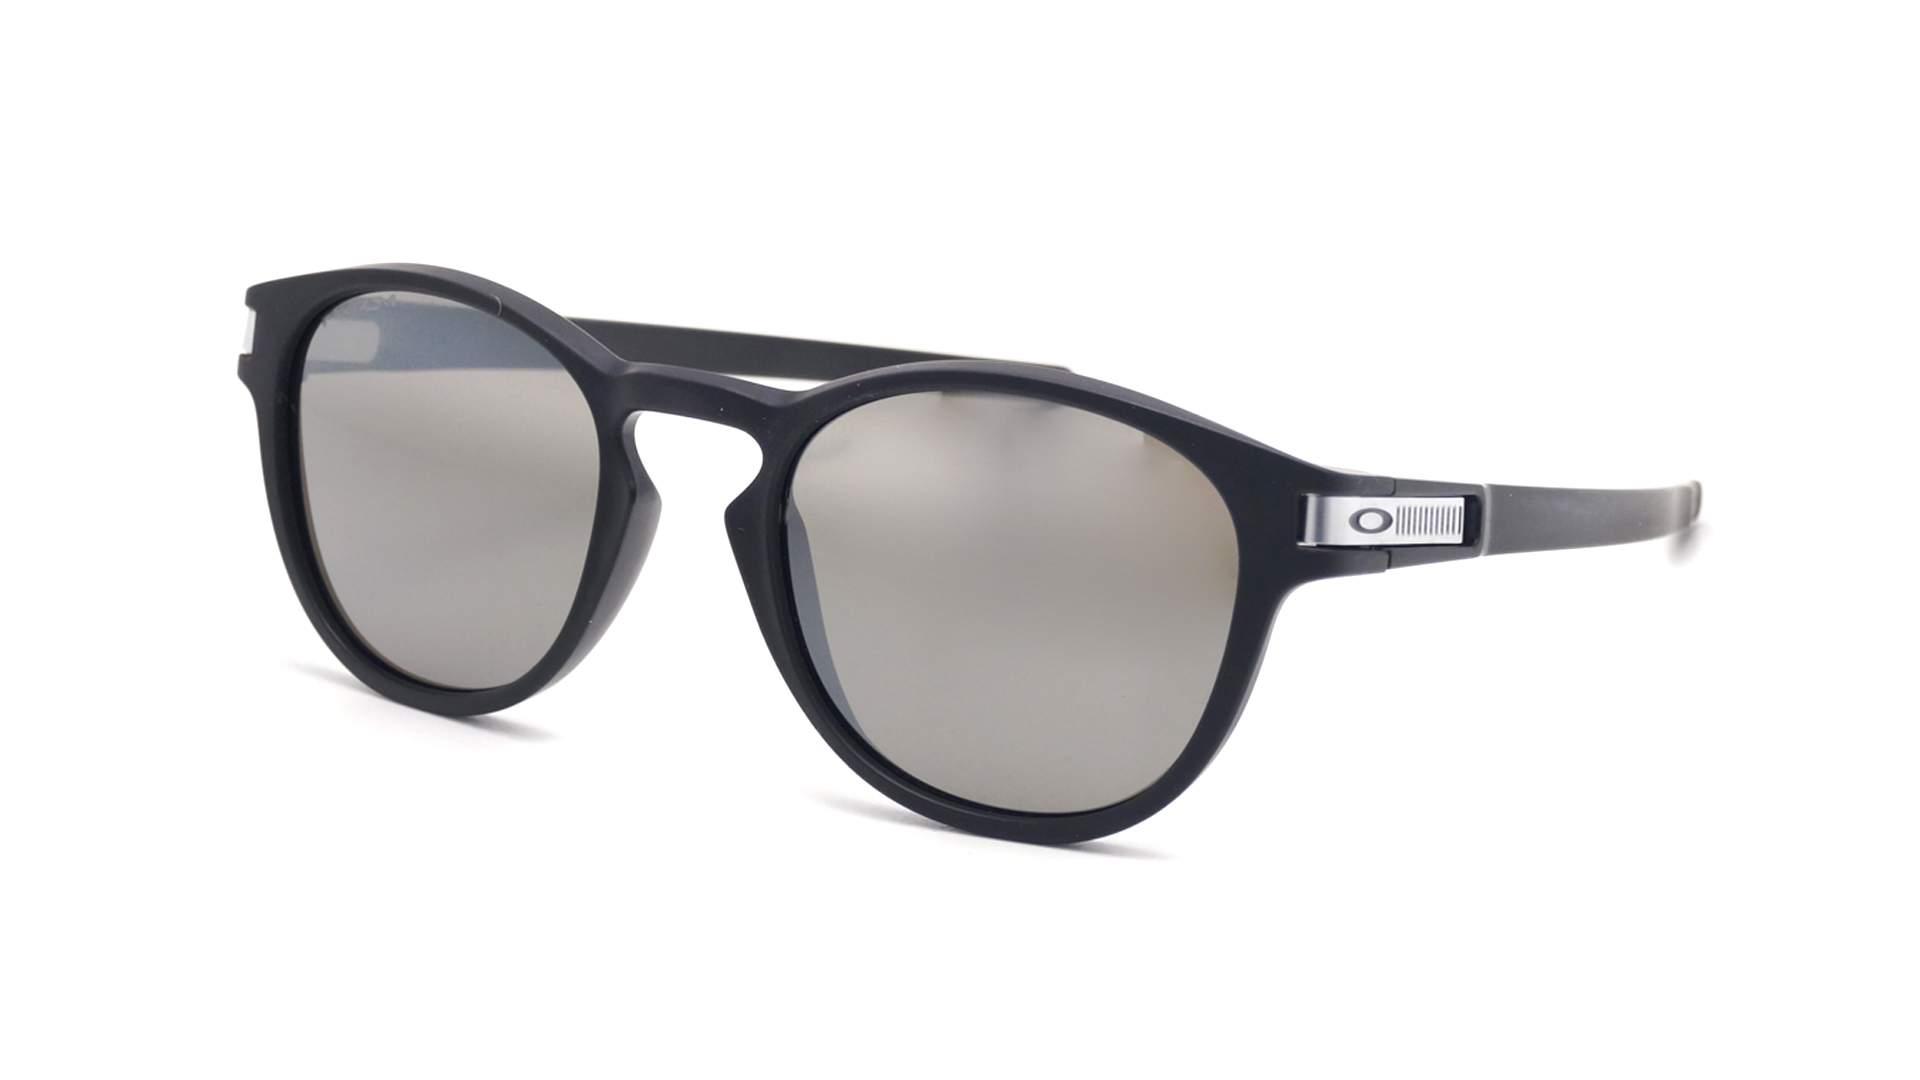 cf5a0c73f76046 Lunettes de soleil Oakley Latch Grid collection Noir Mat OO9265 40 53-21  Medium